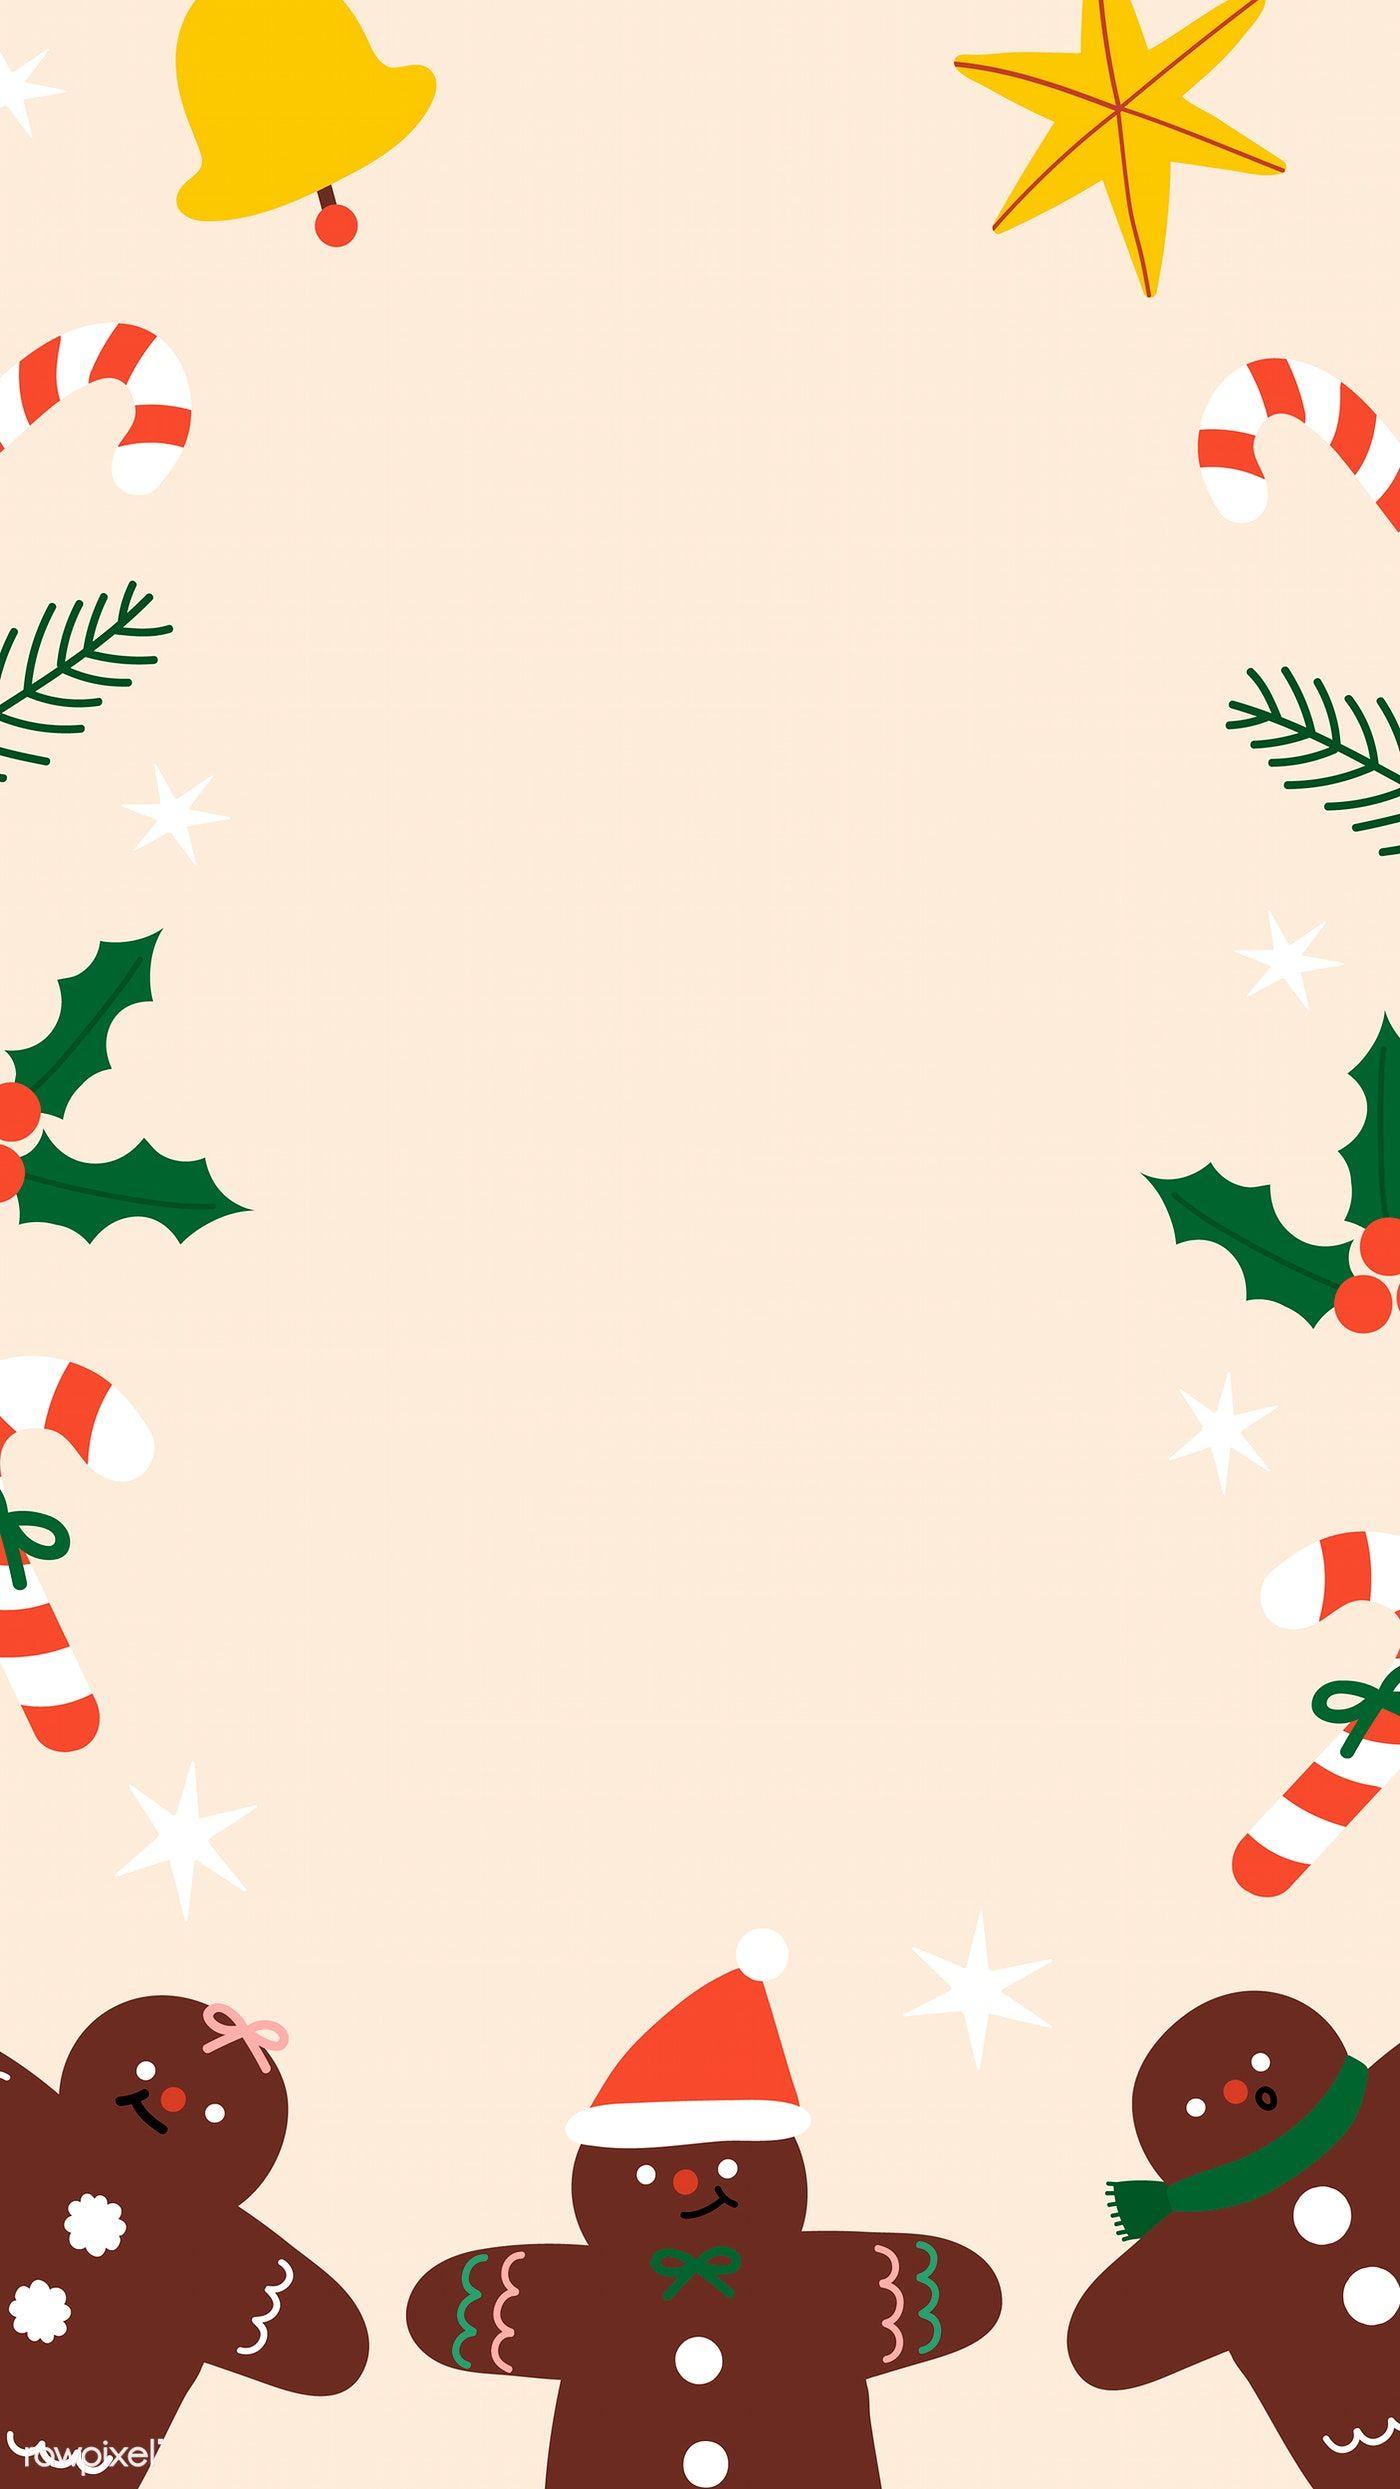 Download Premium Vector Of Festive Christmas Gingerbread Man Frame Mobile Wallpaper Iphone Christmas Cute Christmas Wallpaper Christmas Phone Wallpaper